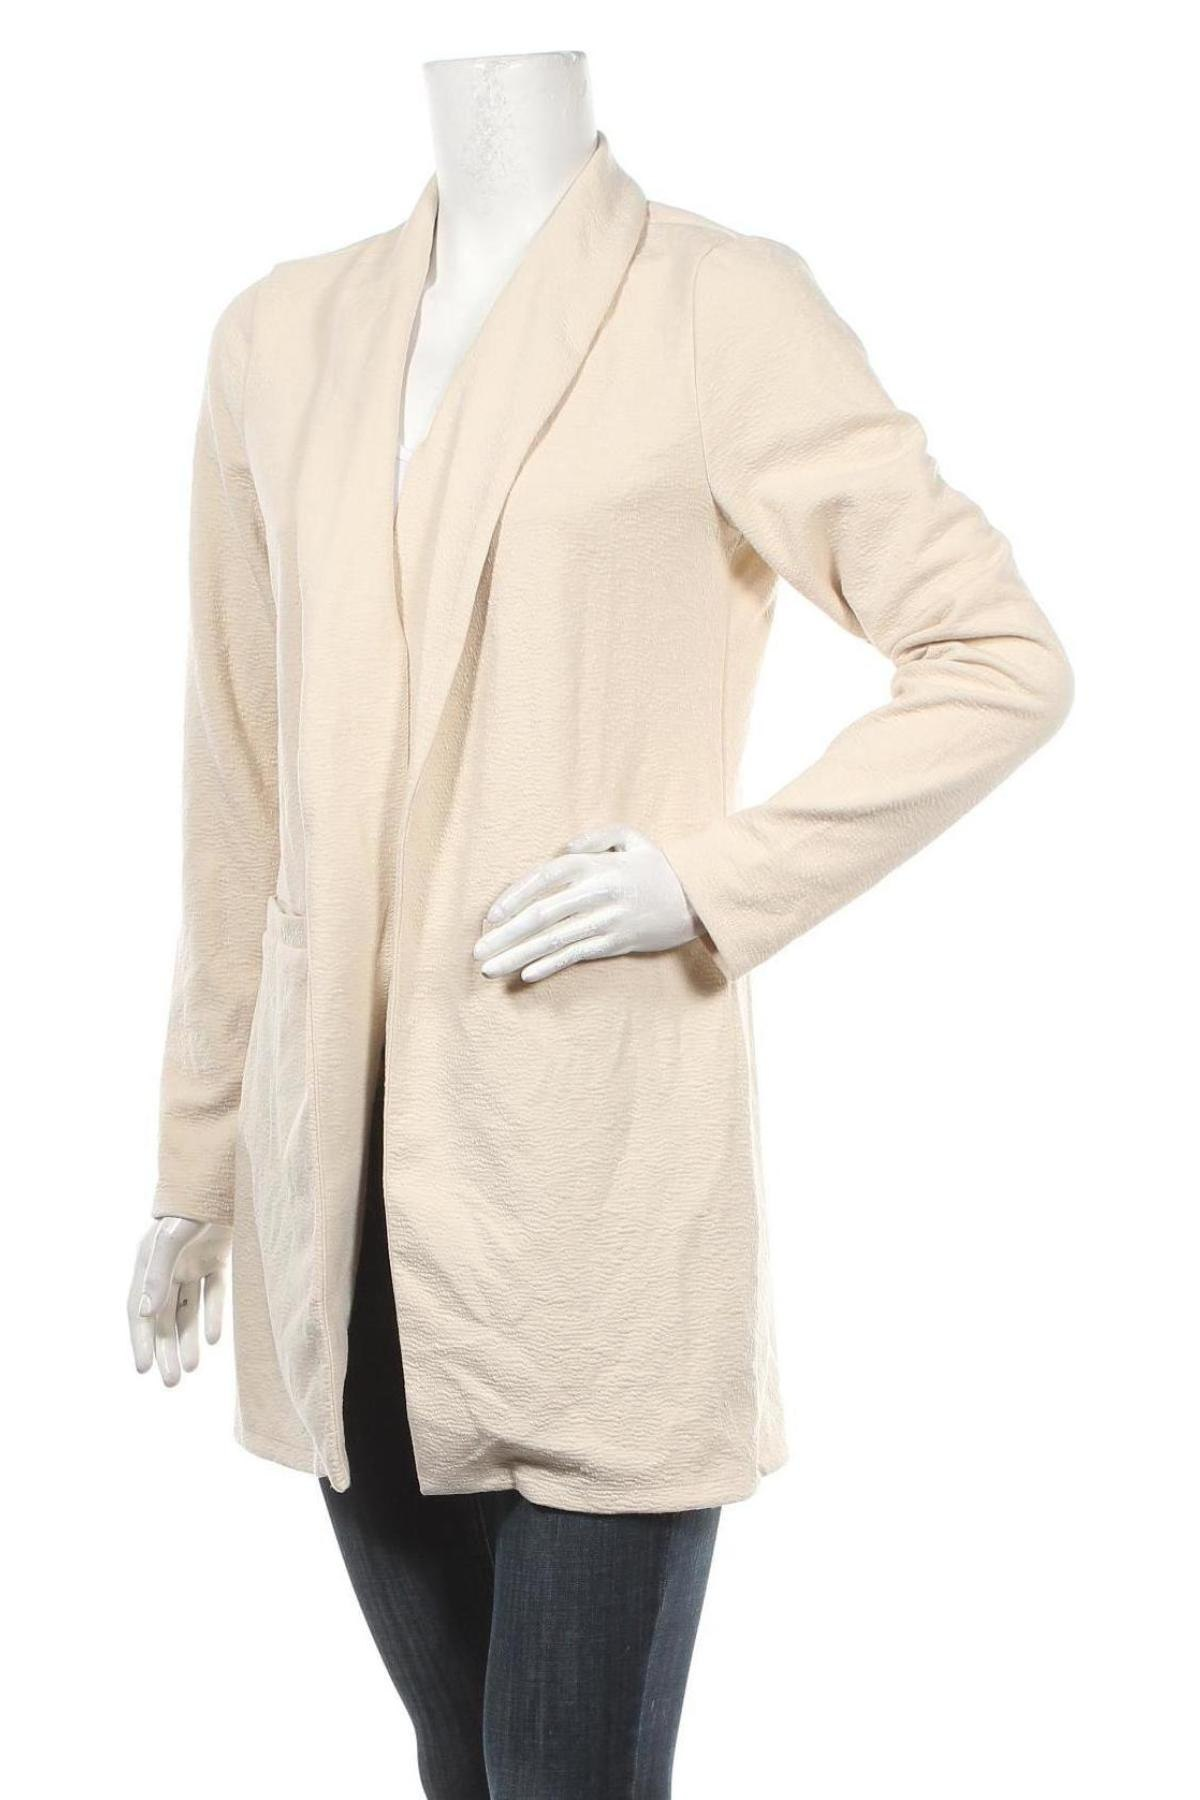 Дамско сако Vero Moda, Размер M, Цвят Бежов, 96% полиестер, 4% еластан, Цена 19,00лв.